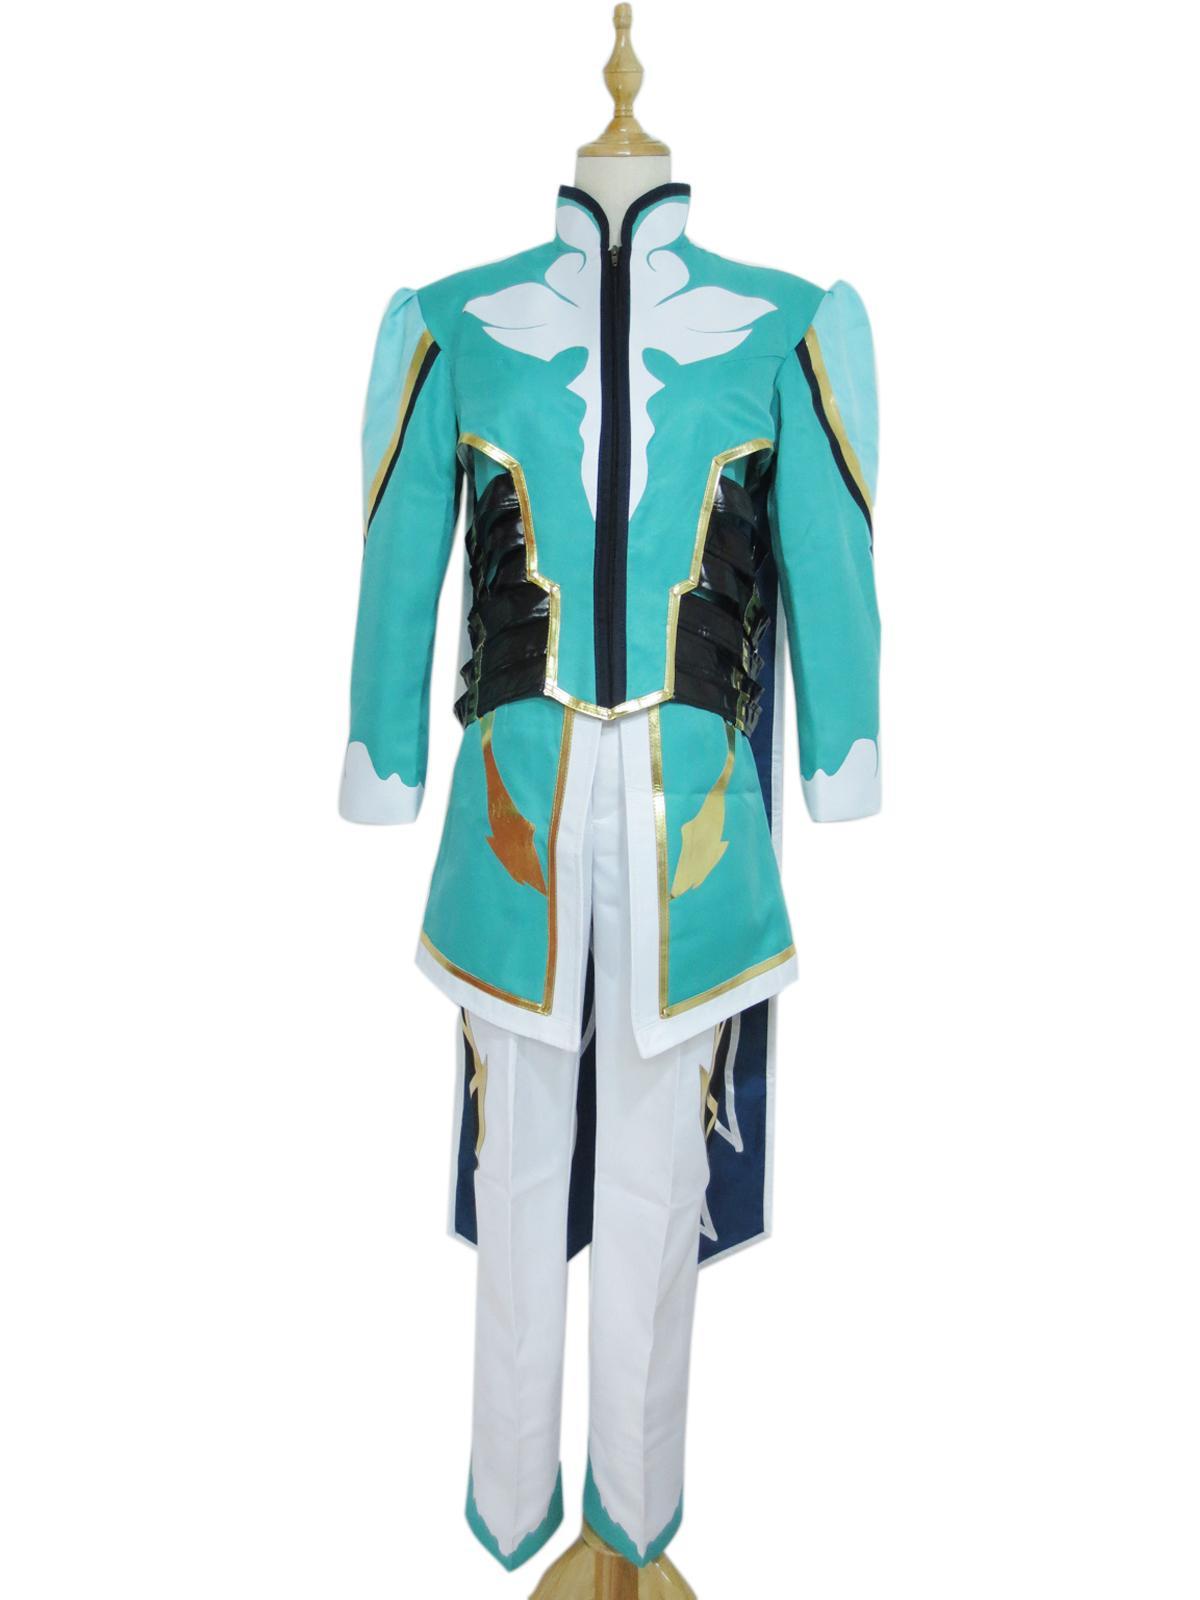 Mikleo Halloween 2020 Tales Of Zestiria Mikleo Halloween Uniform Set Cosplay Costume